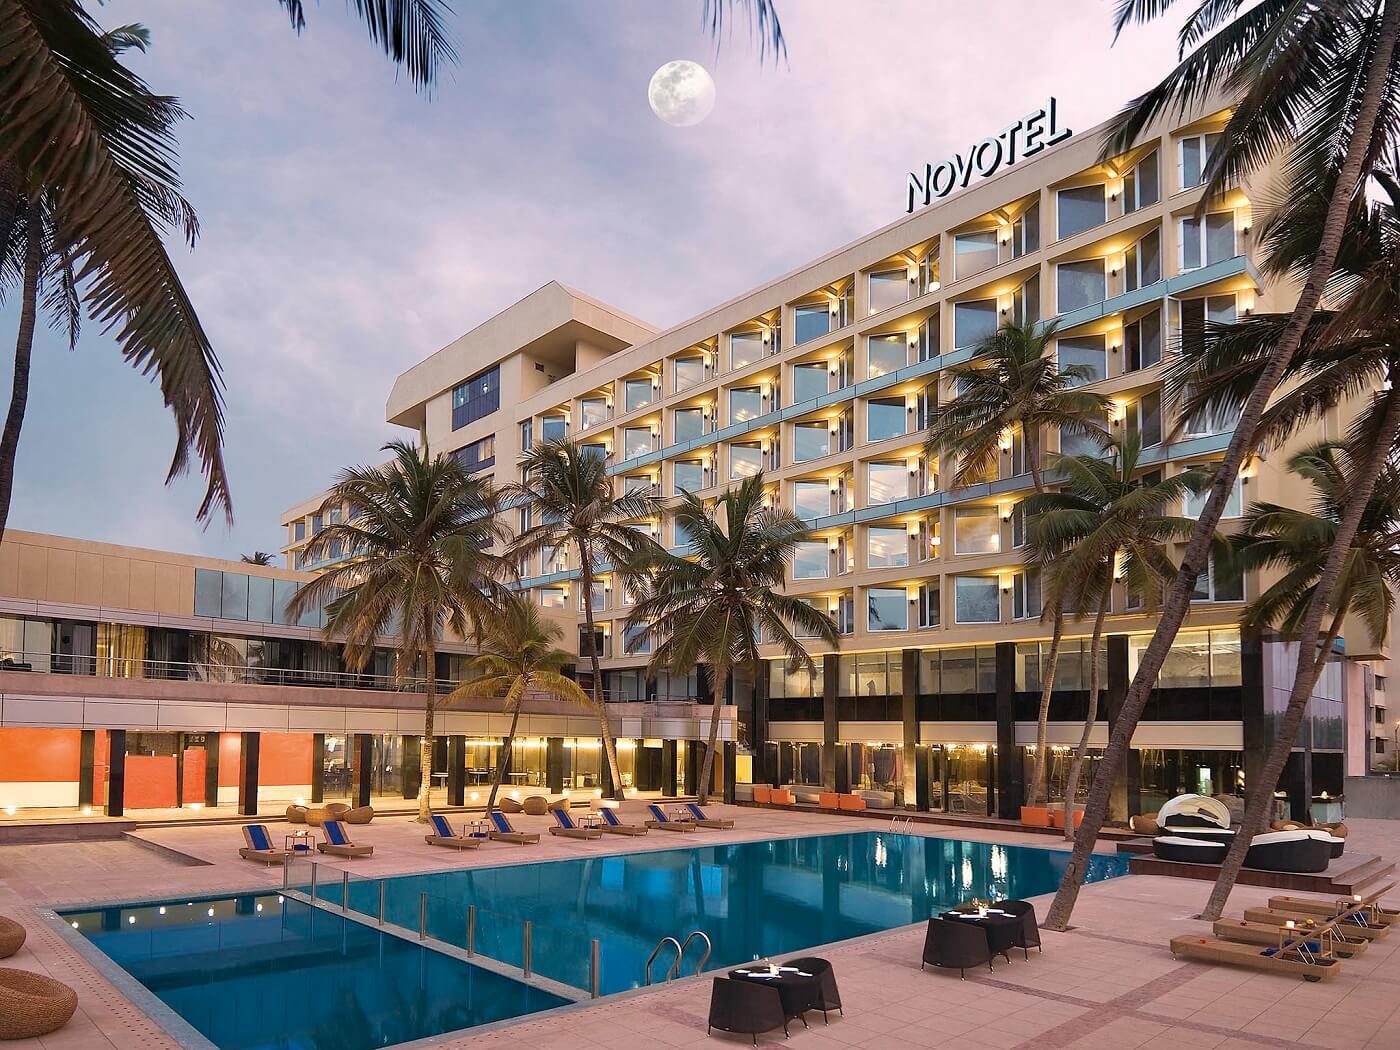 Hotel Novotel Mumbai